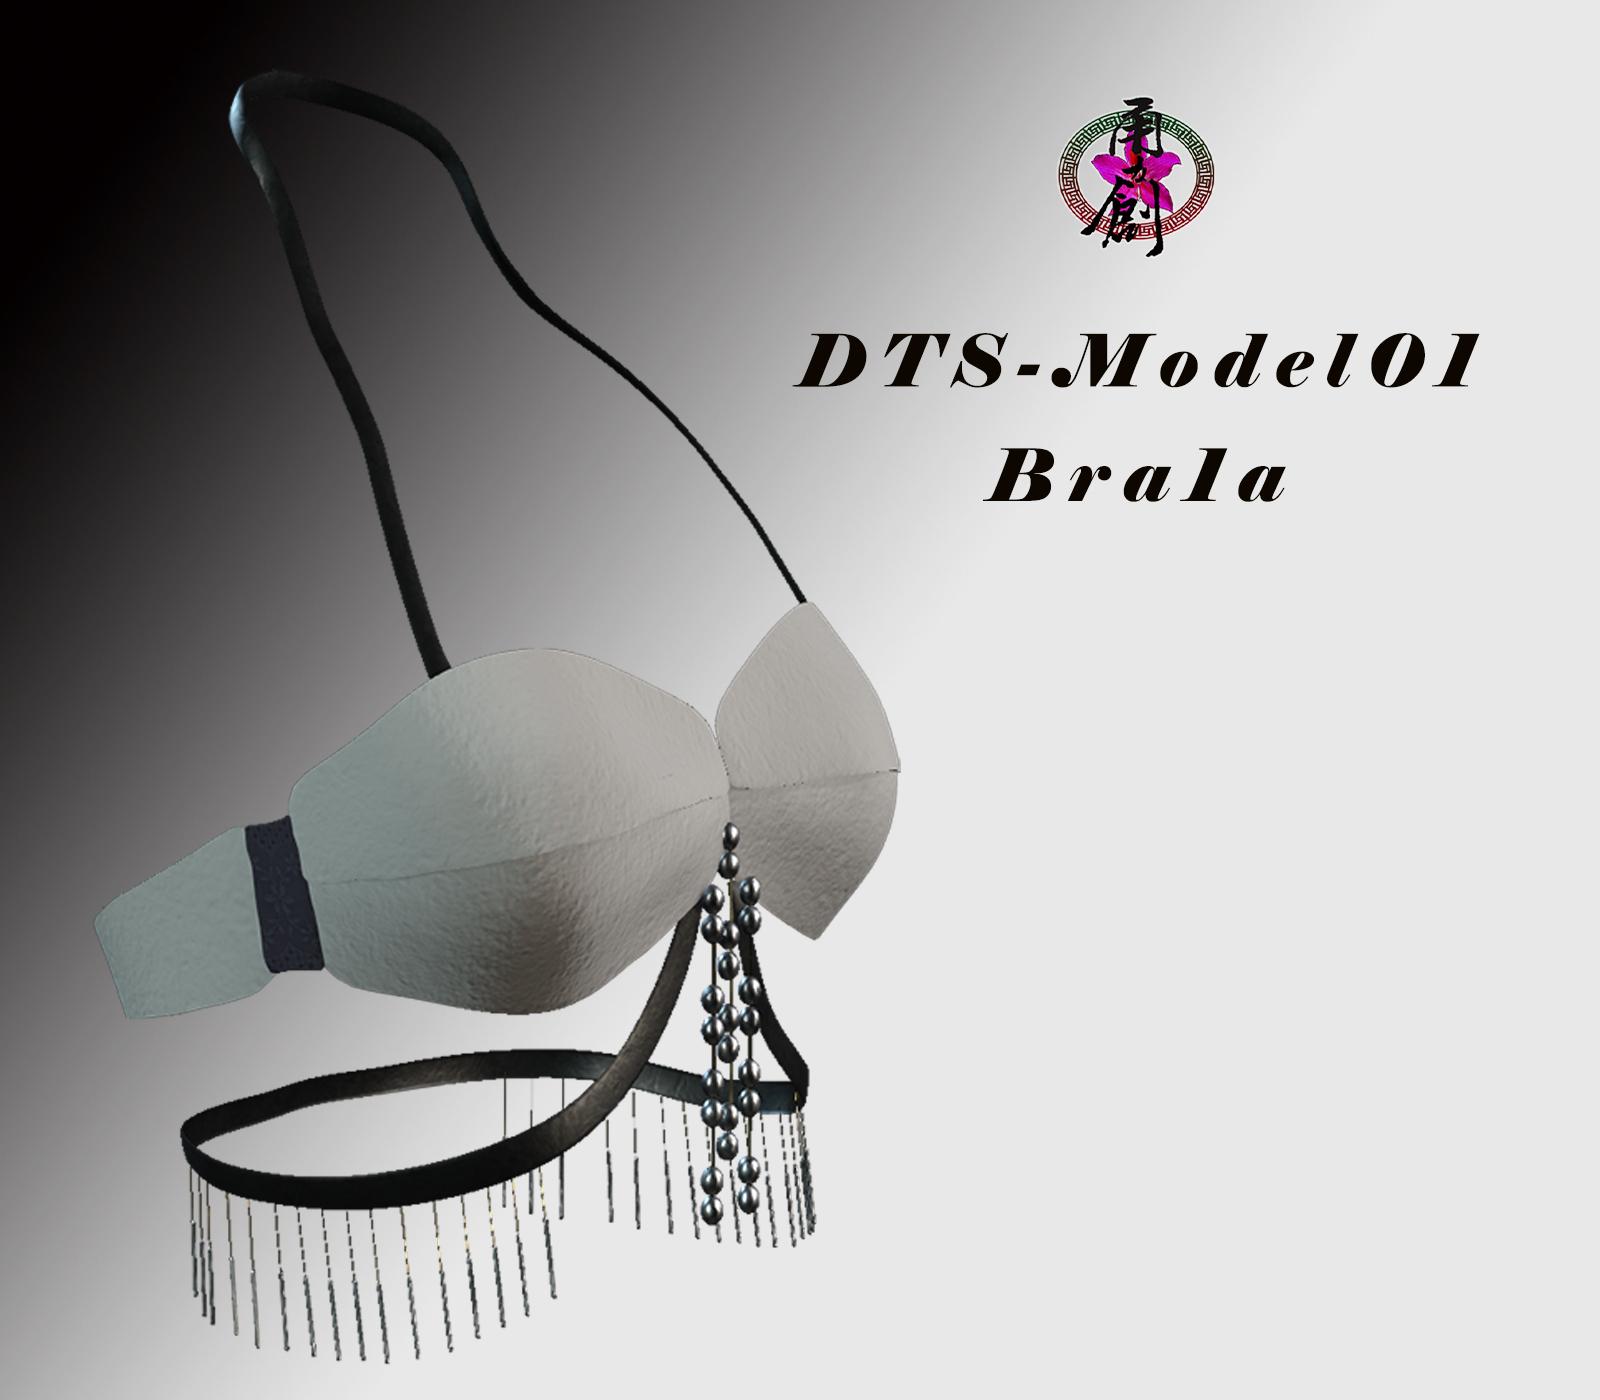 DTS-Model01-Bra1A